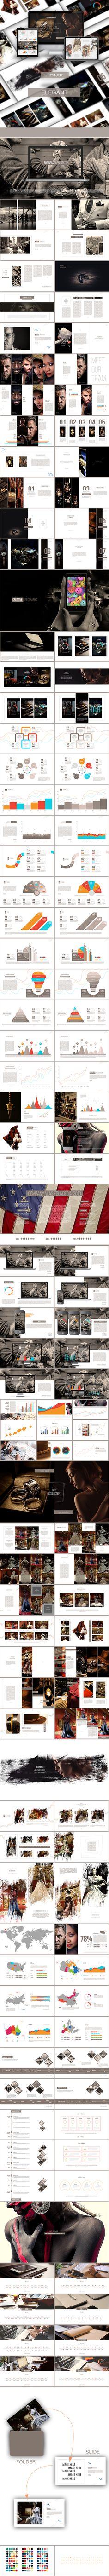 Elegant Keynote Template. Download here: http://graphicriver.net/item/elegant-keynote-template/15513742?ref=ksioks